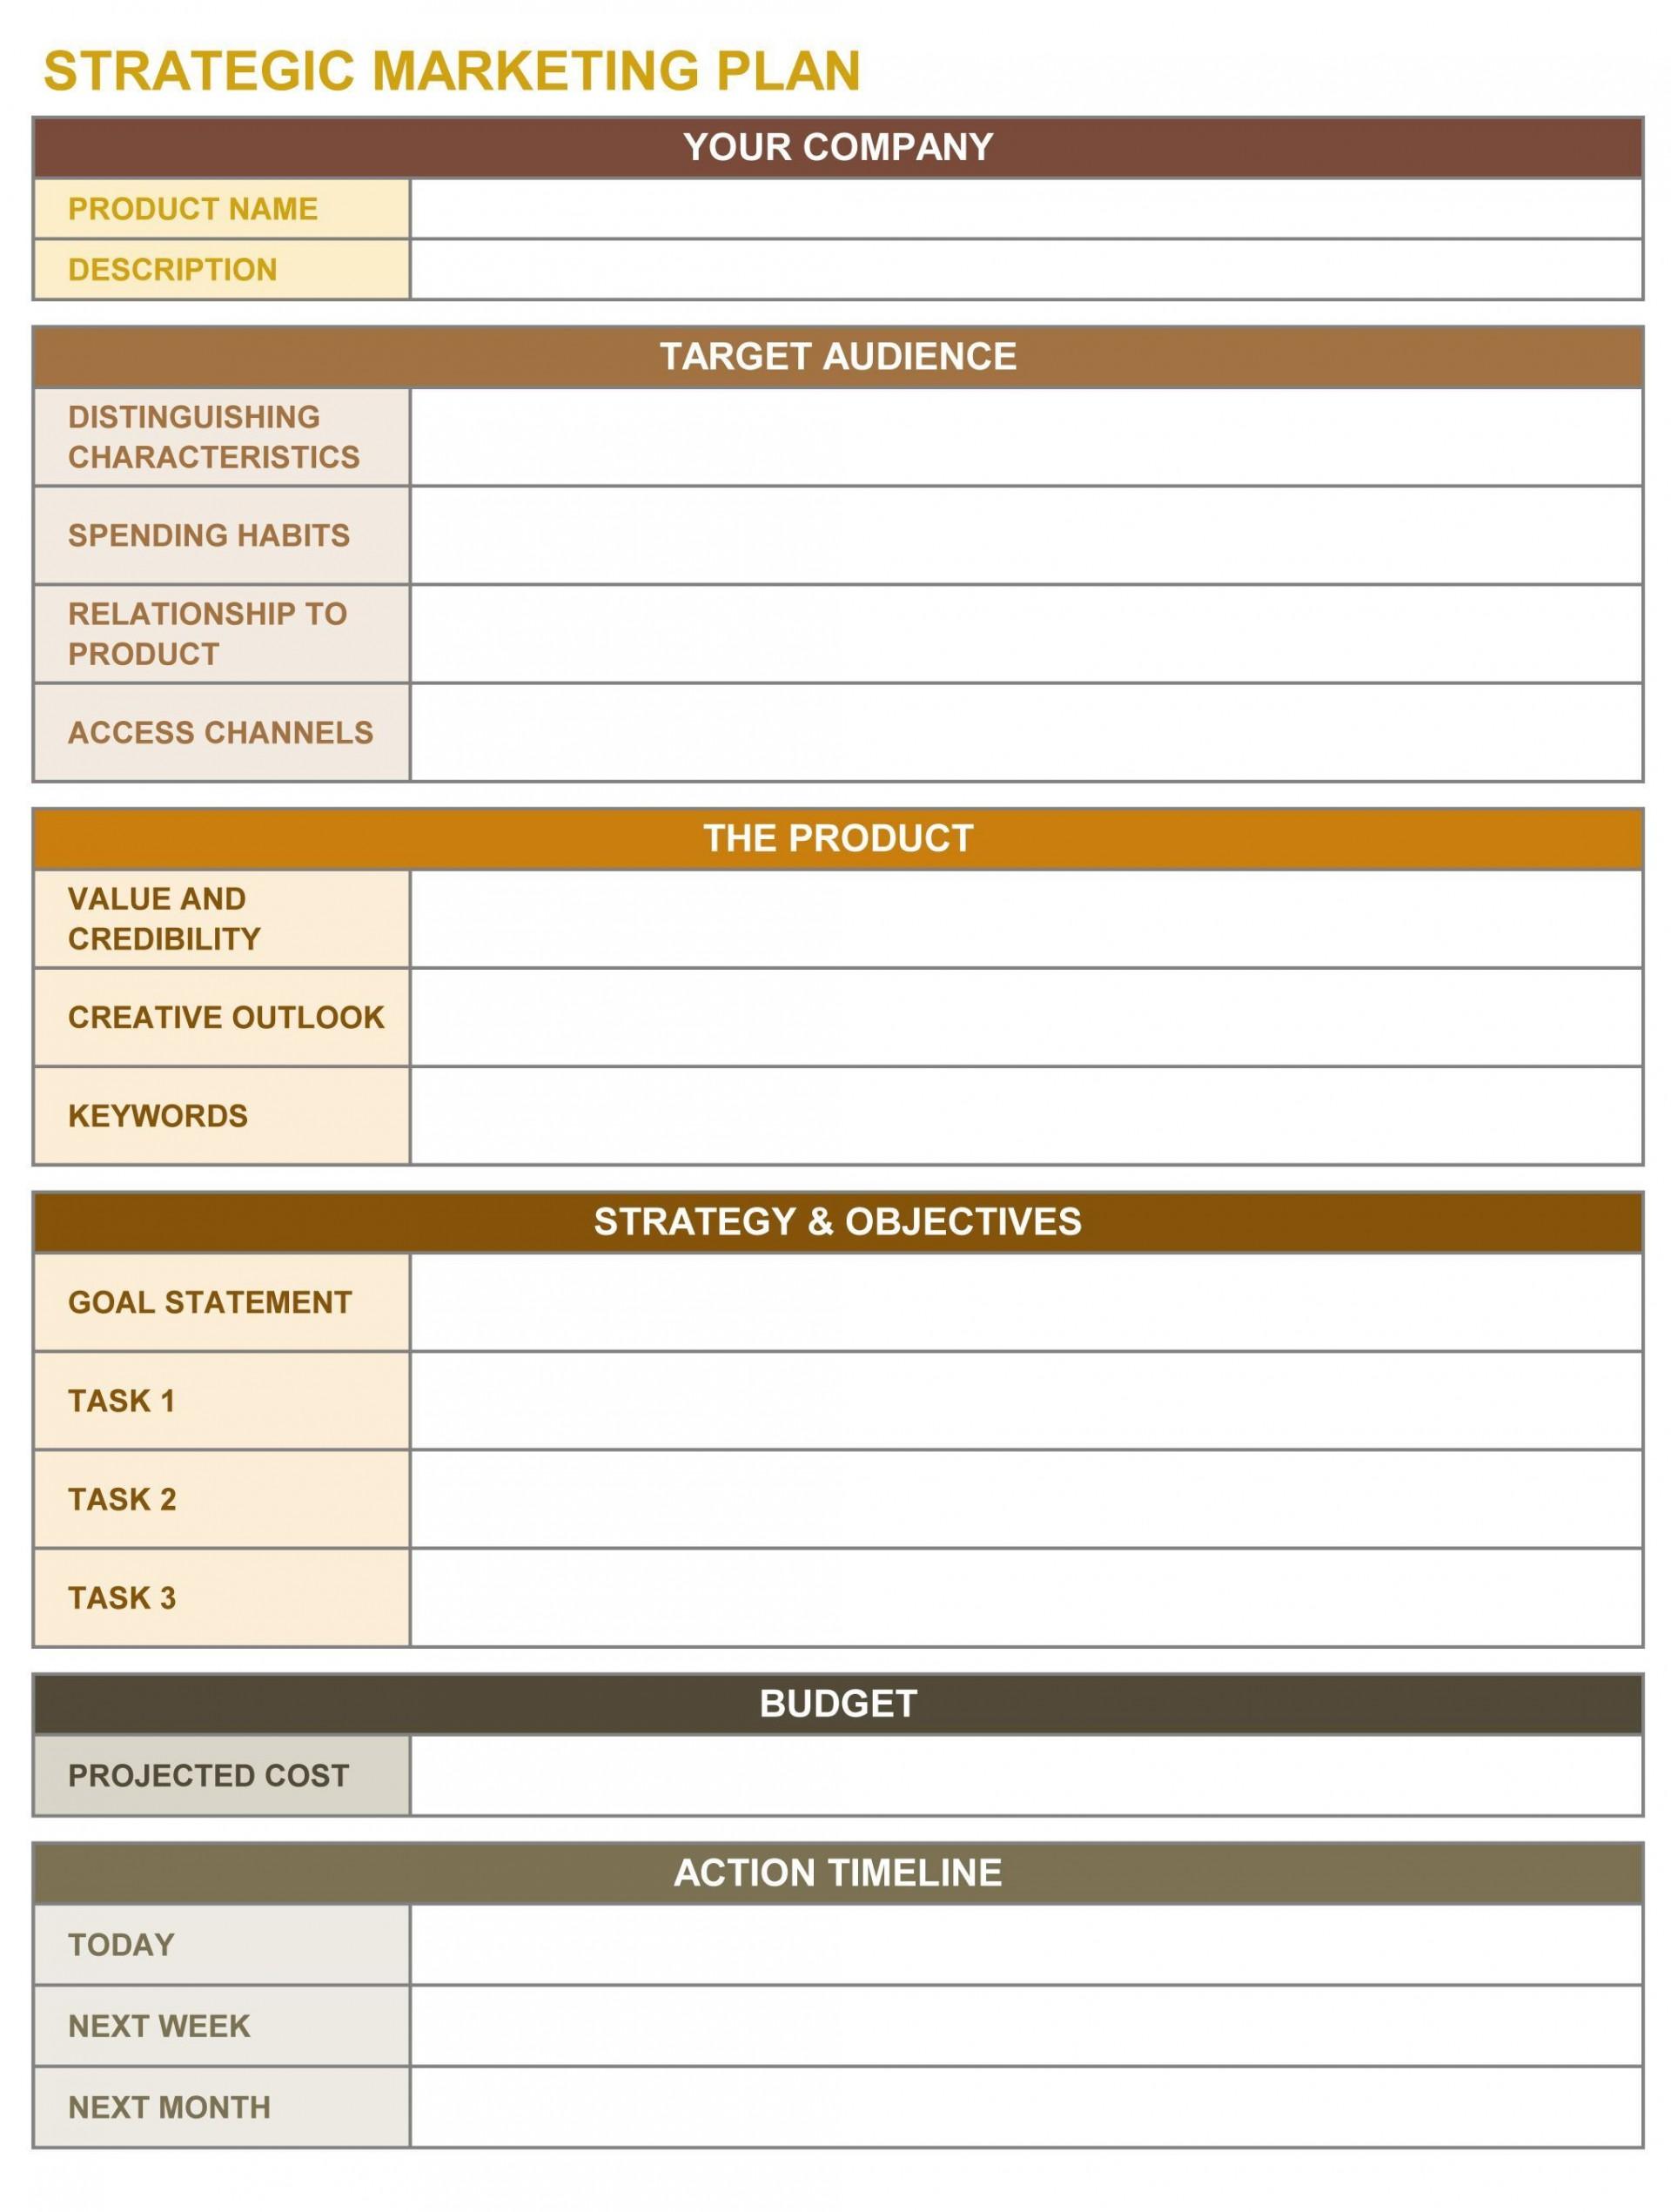 000 Wondrou Strategic Marketing Plan Template Image  Templates Example Pdf Word Sample1920